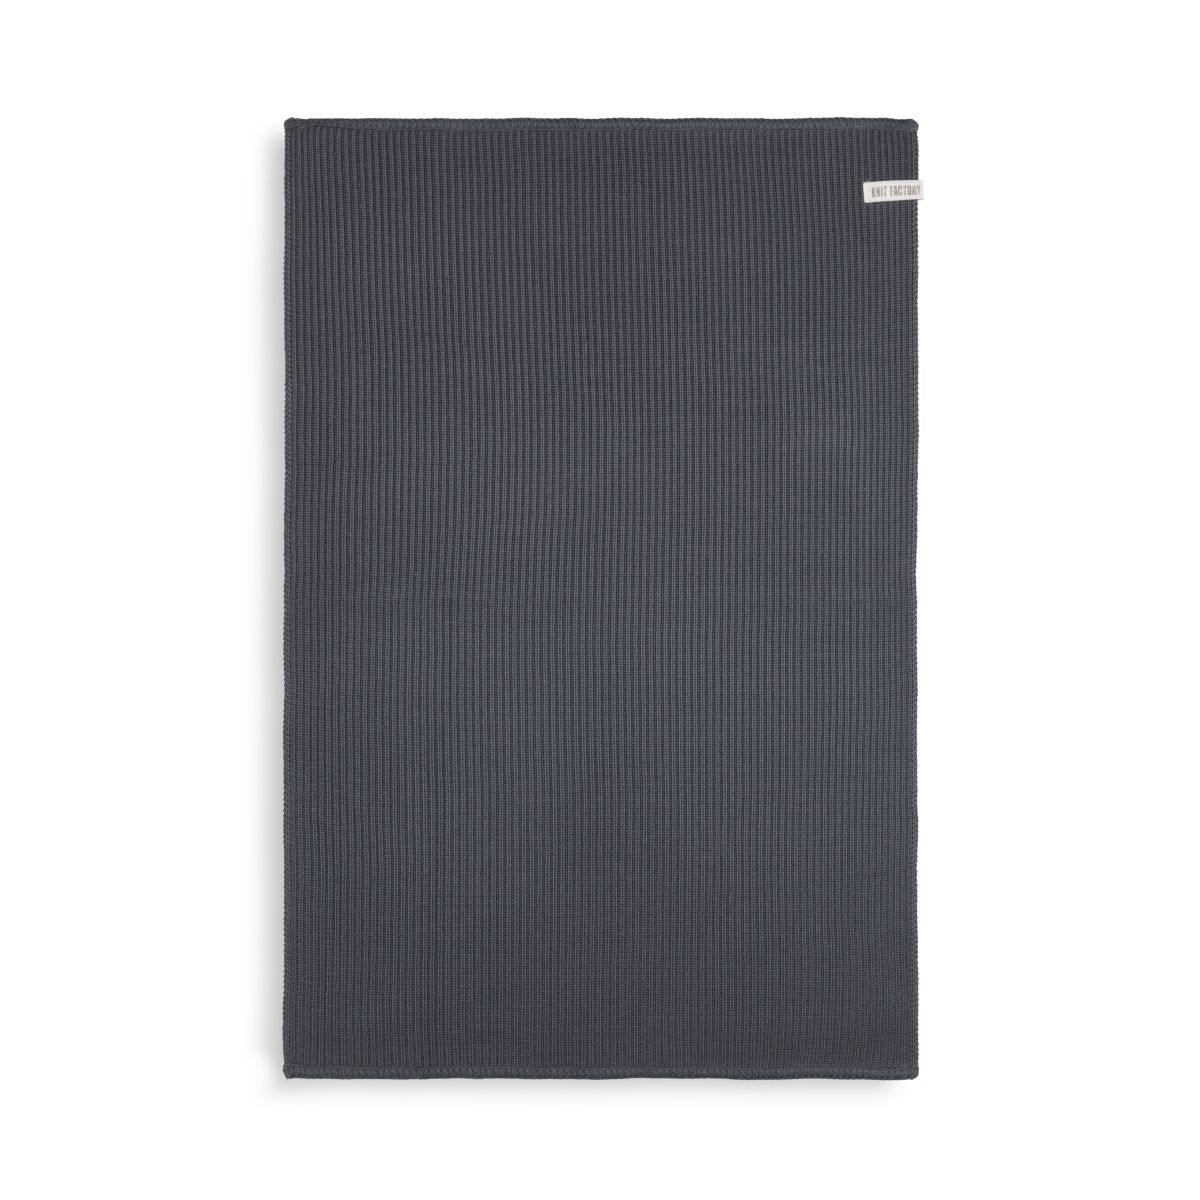 knit factory kf20322801052 badmat morres antraciet 80x50 1